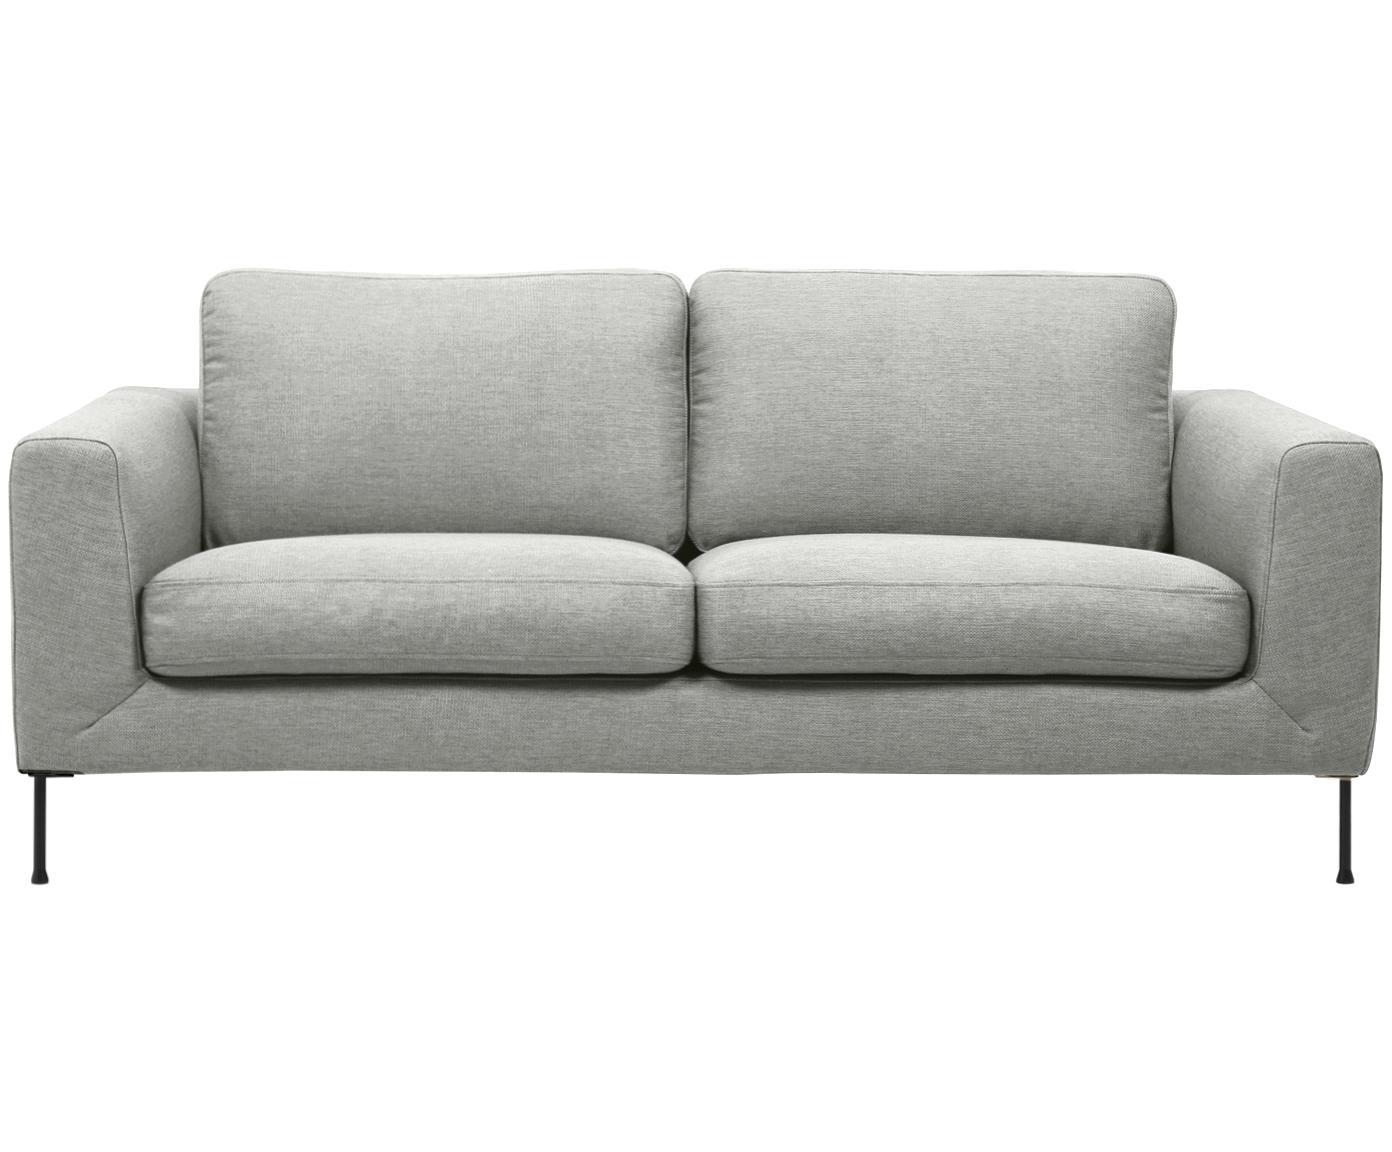 Sofa Cucita (2-Sitzer), Bezug: Webstoff (Polyester) 45.0, Gestell: Massives Kiefernholz, Webstoff Hellgrau, B 187 x T 94 cm